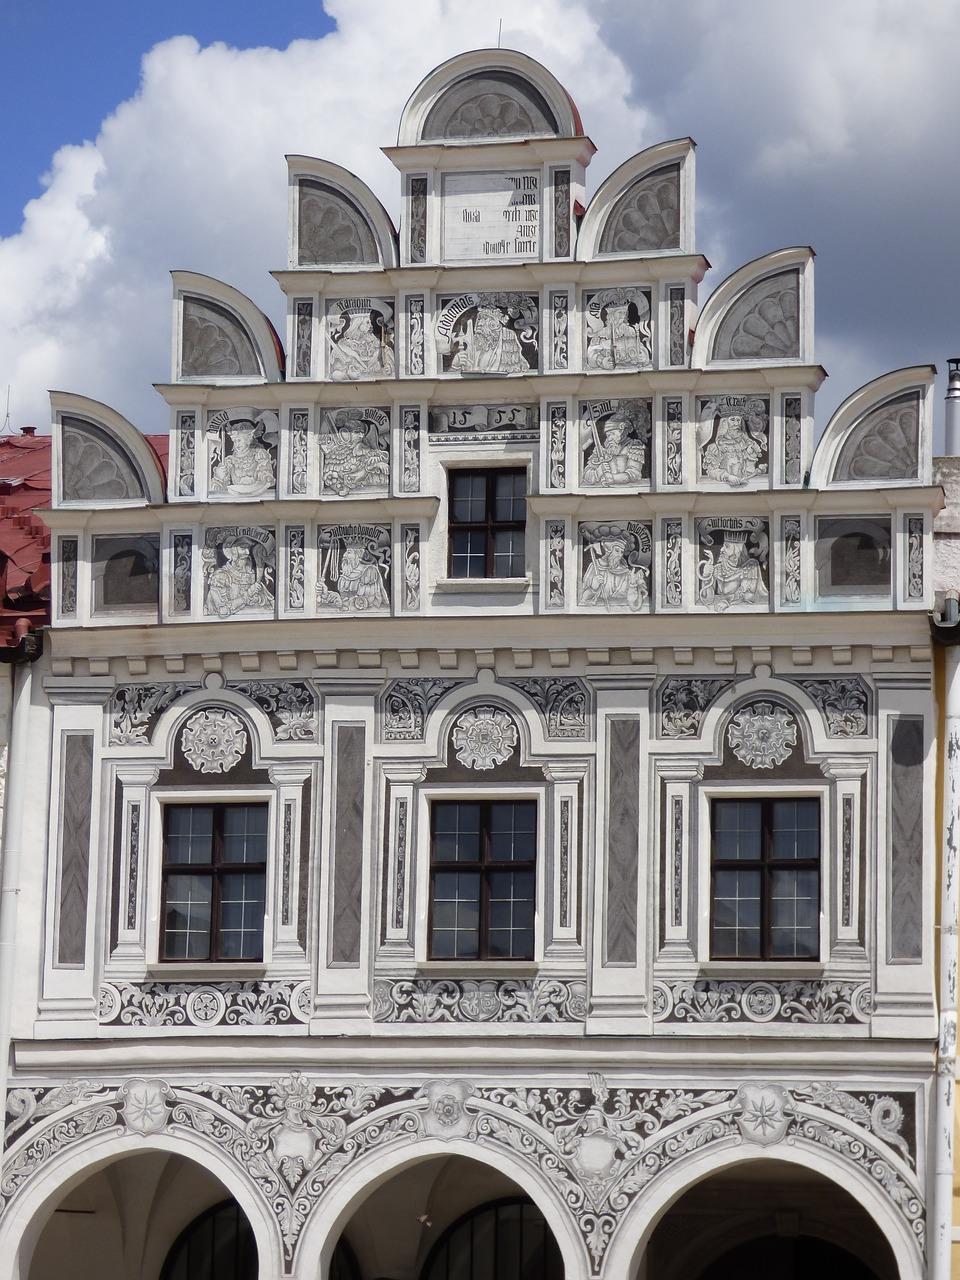 WINDOW KAMIENICA DECORATING DECORATIVE FAçADES FREE PHOTO FROM